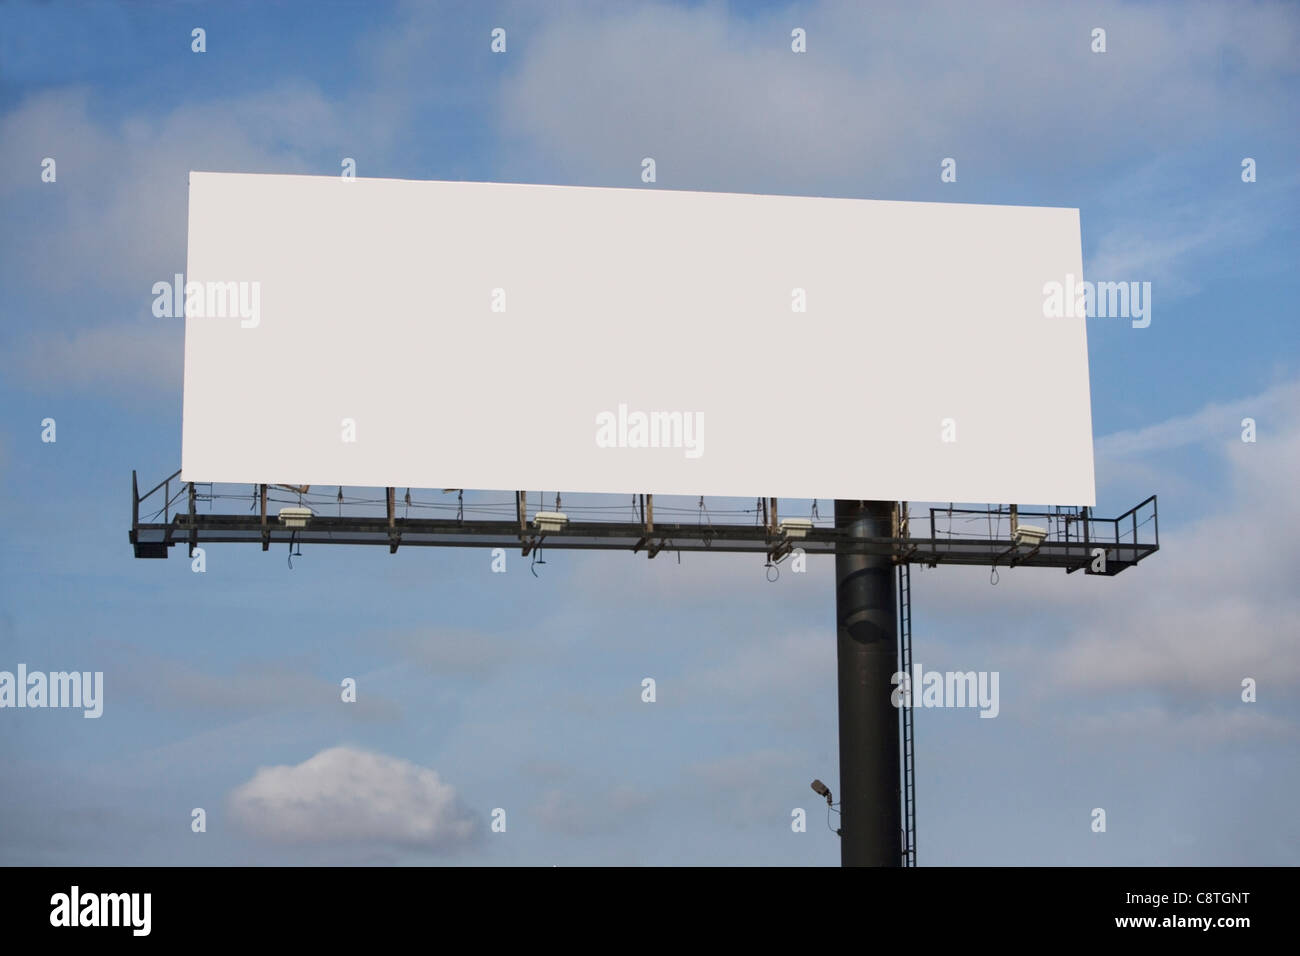 USA, New York State, Blank billboard - Stock Image